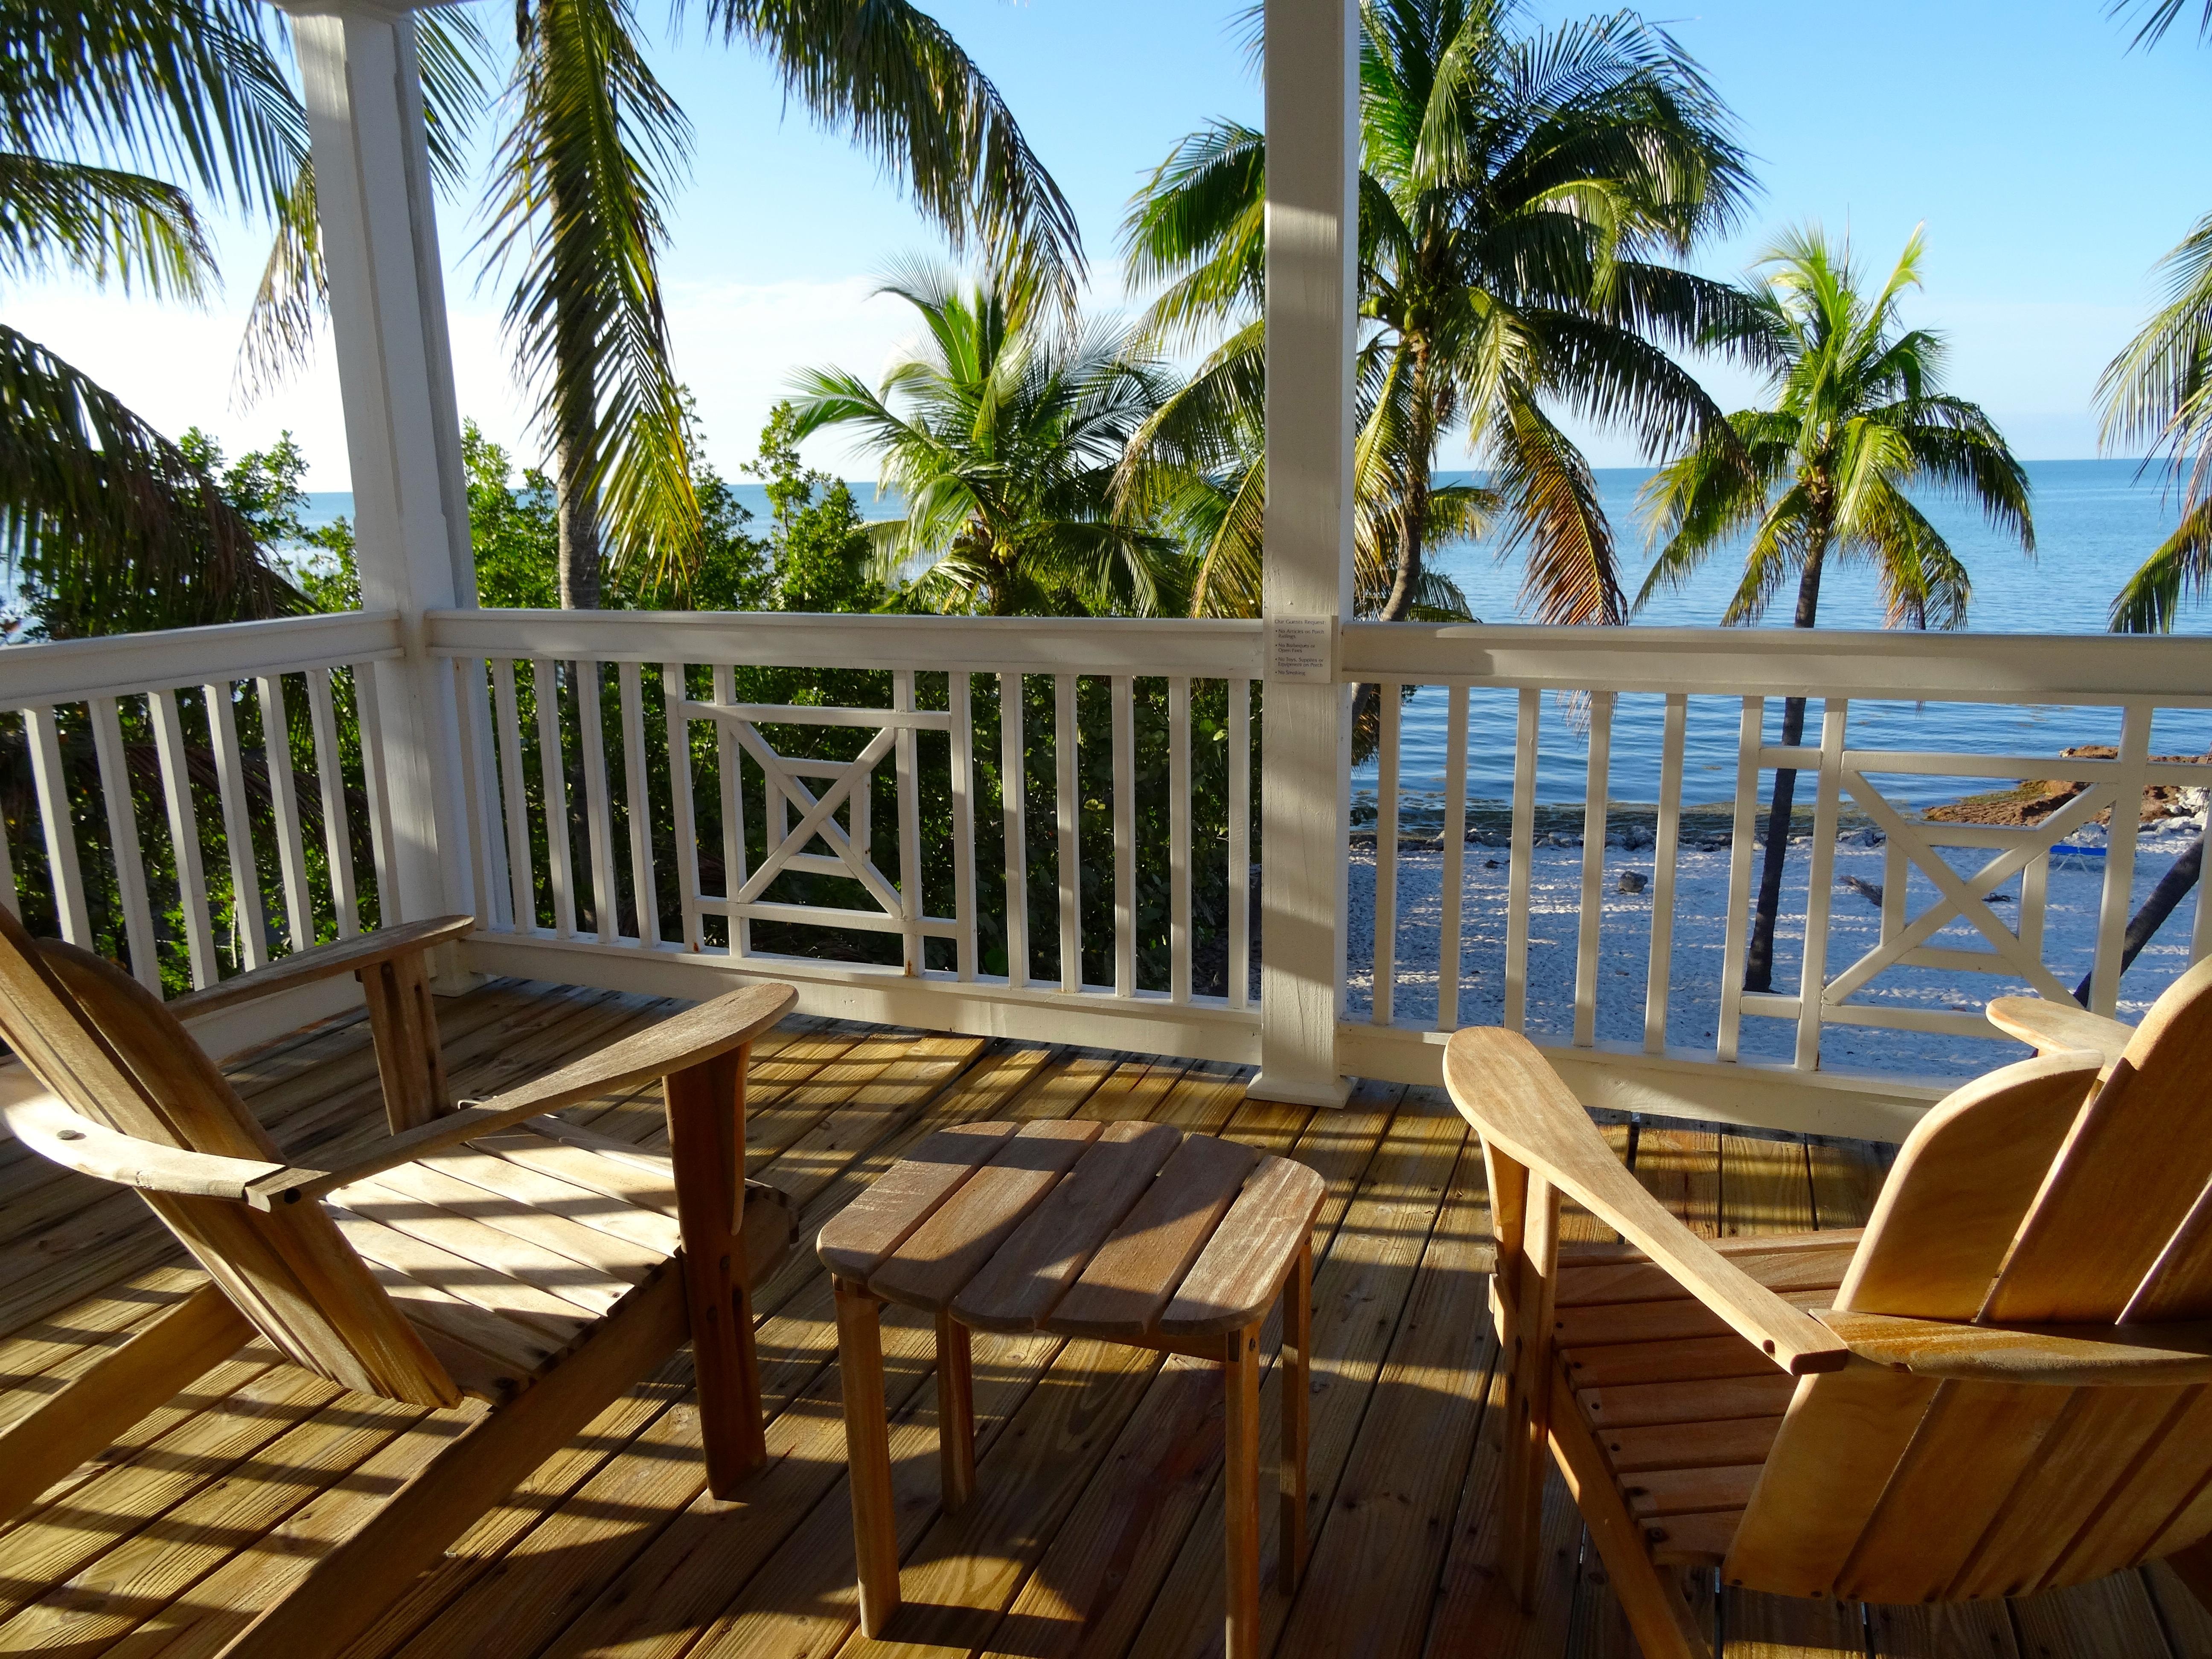 Florida Keys Beach House The Best Beaches In World